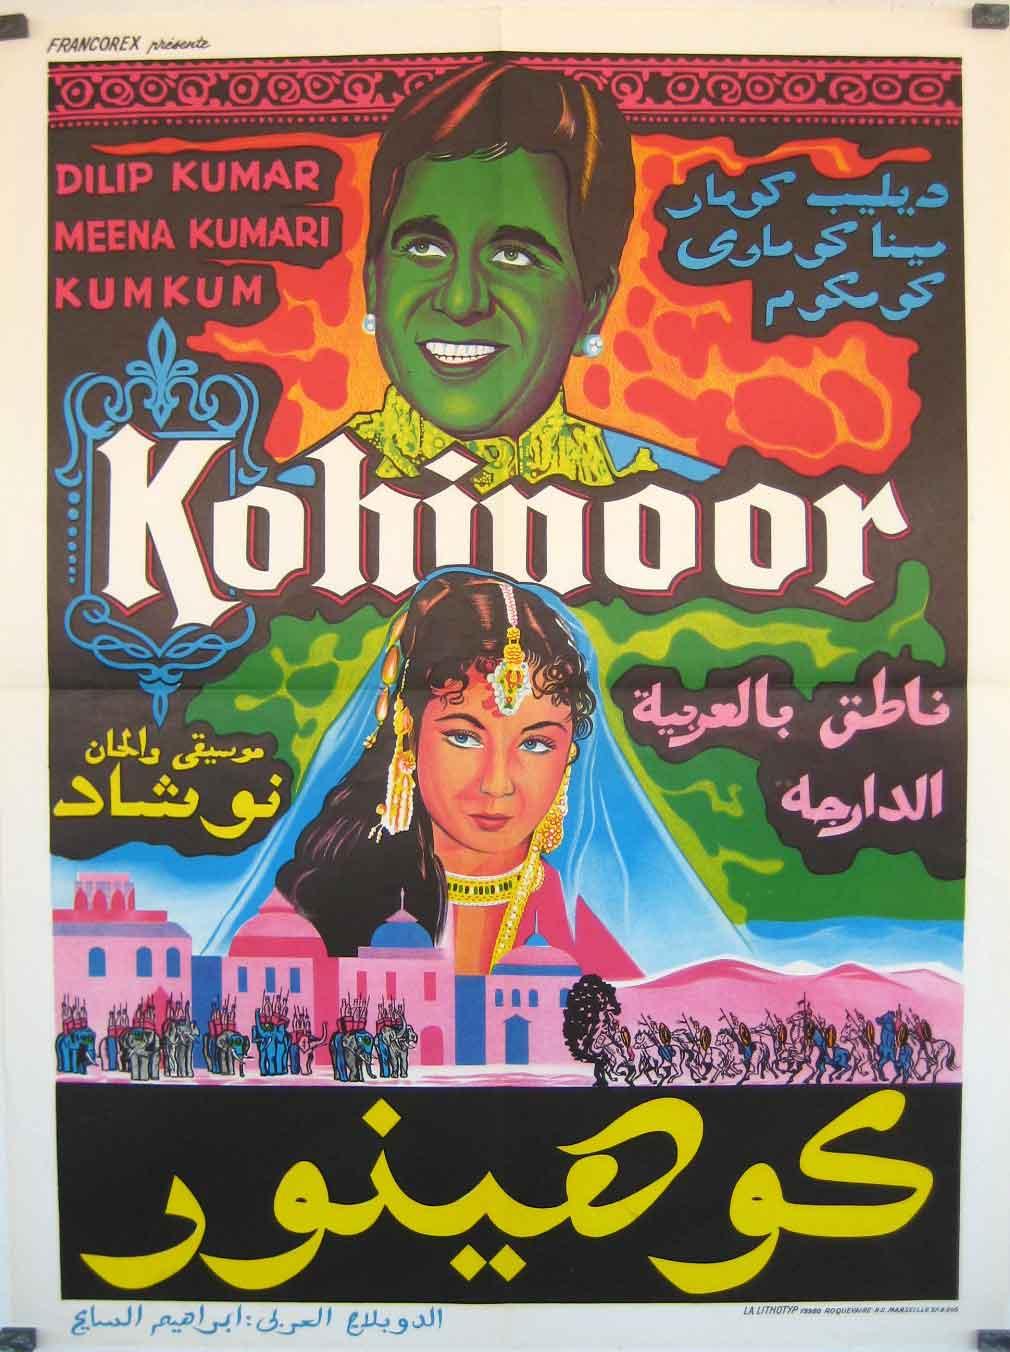 مشاهدة فيلم Kohinoor 1960 مترجم